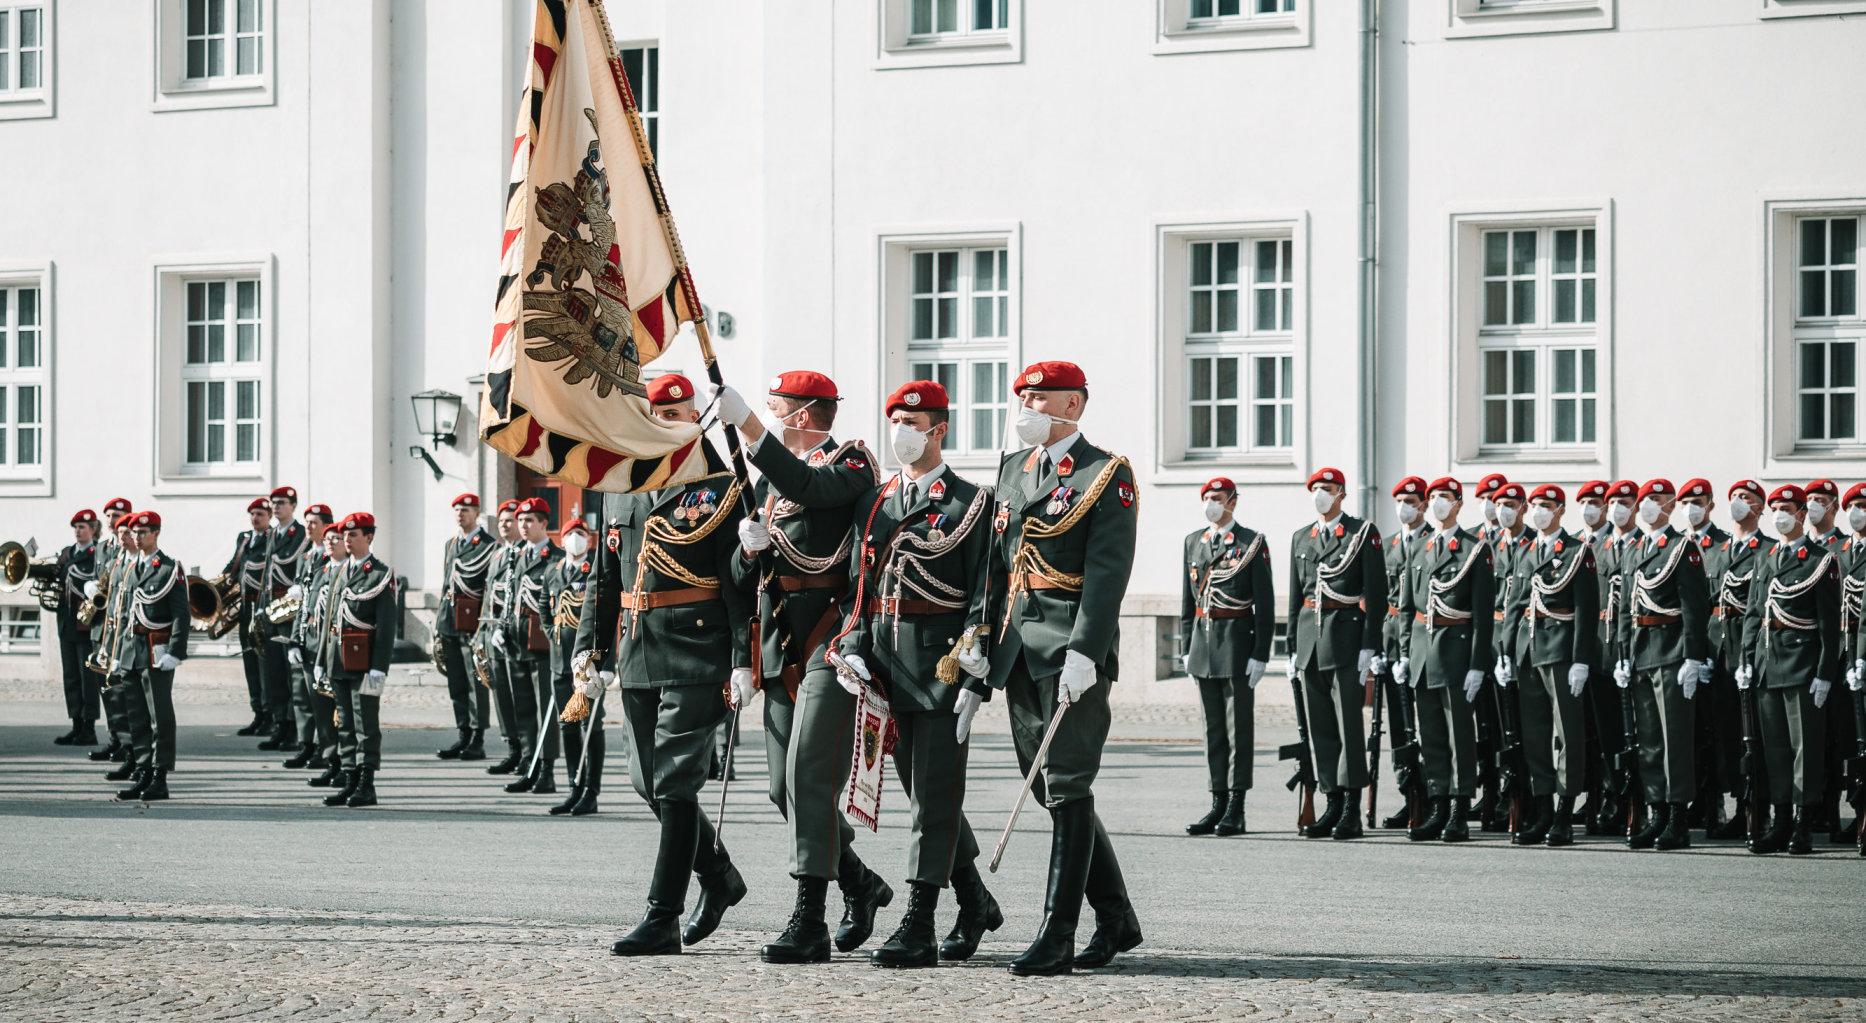 Garde Bundesheer Österreich Wien Maria-Theresien-Kaserne Angelobung am 25.02.2021